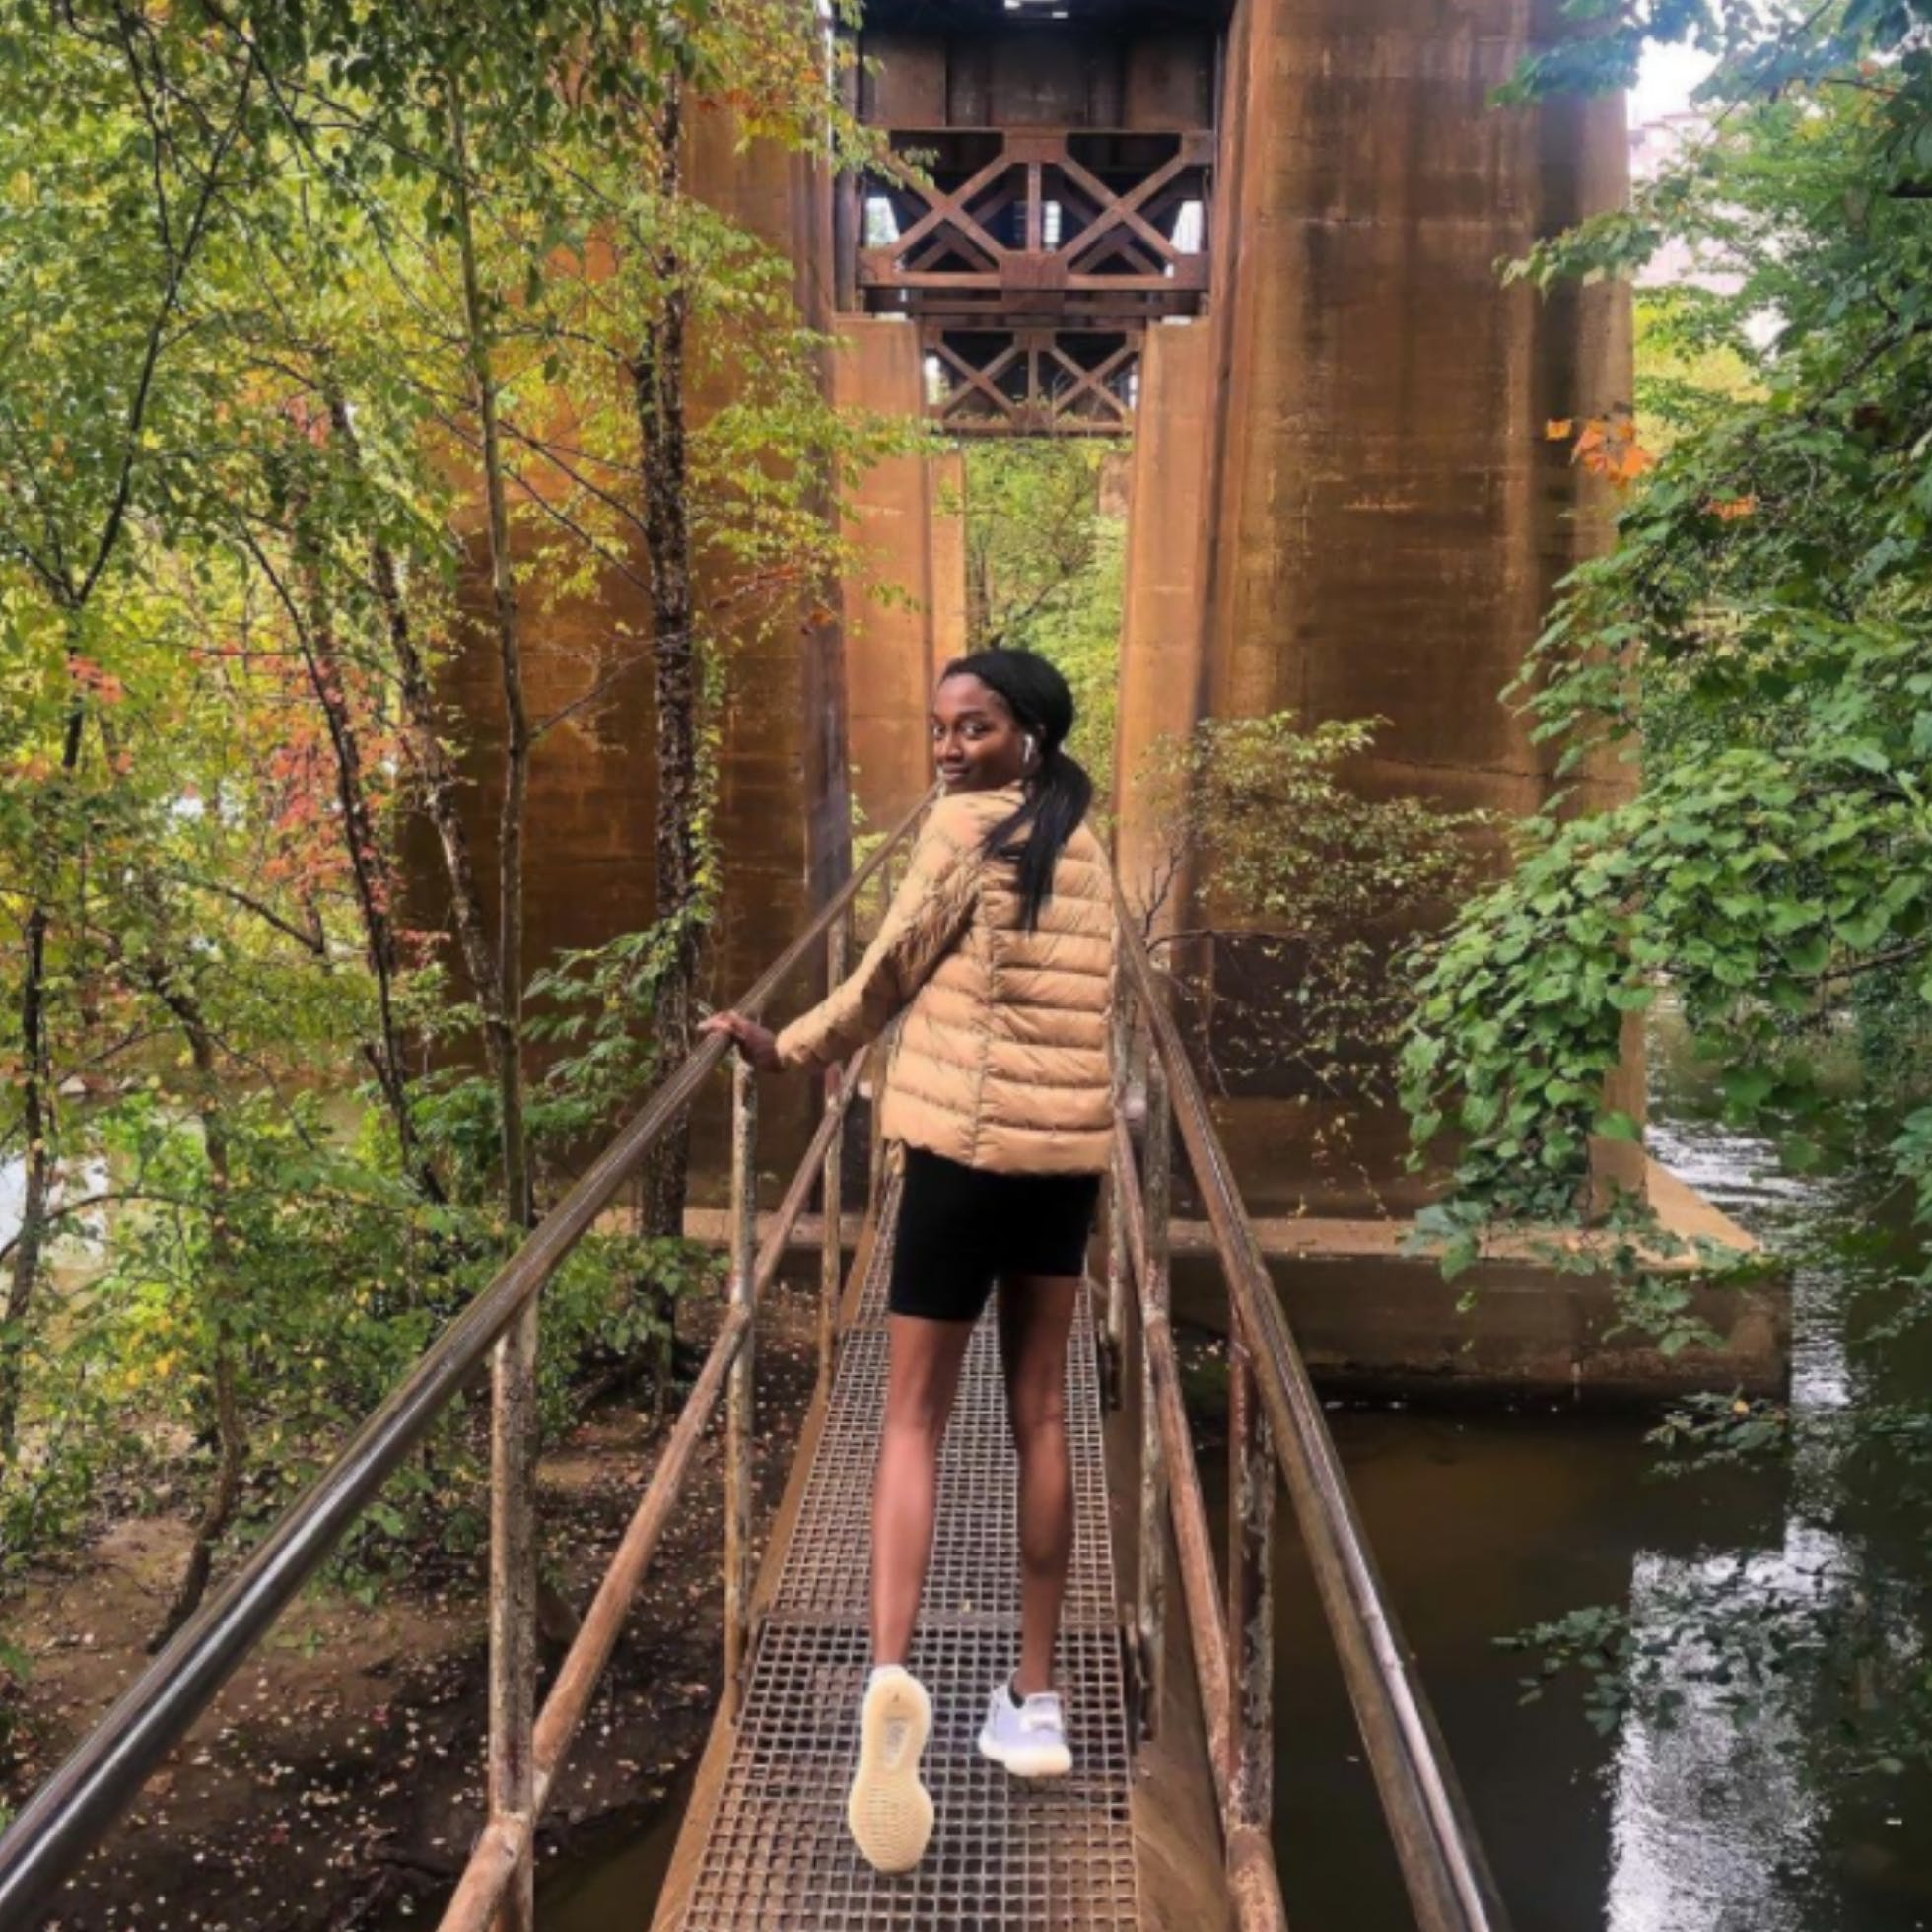 15 Instagram-Worthy Spots to Visit in Downtown Richmond